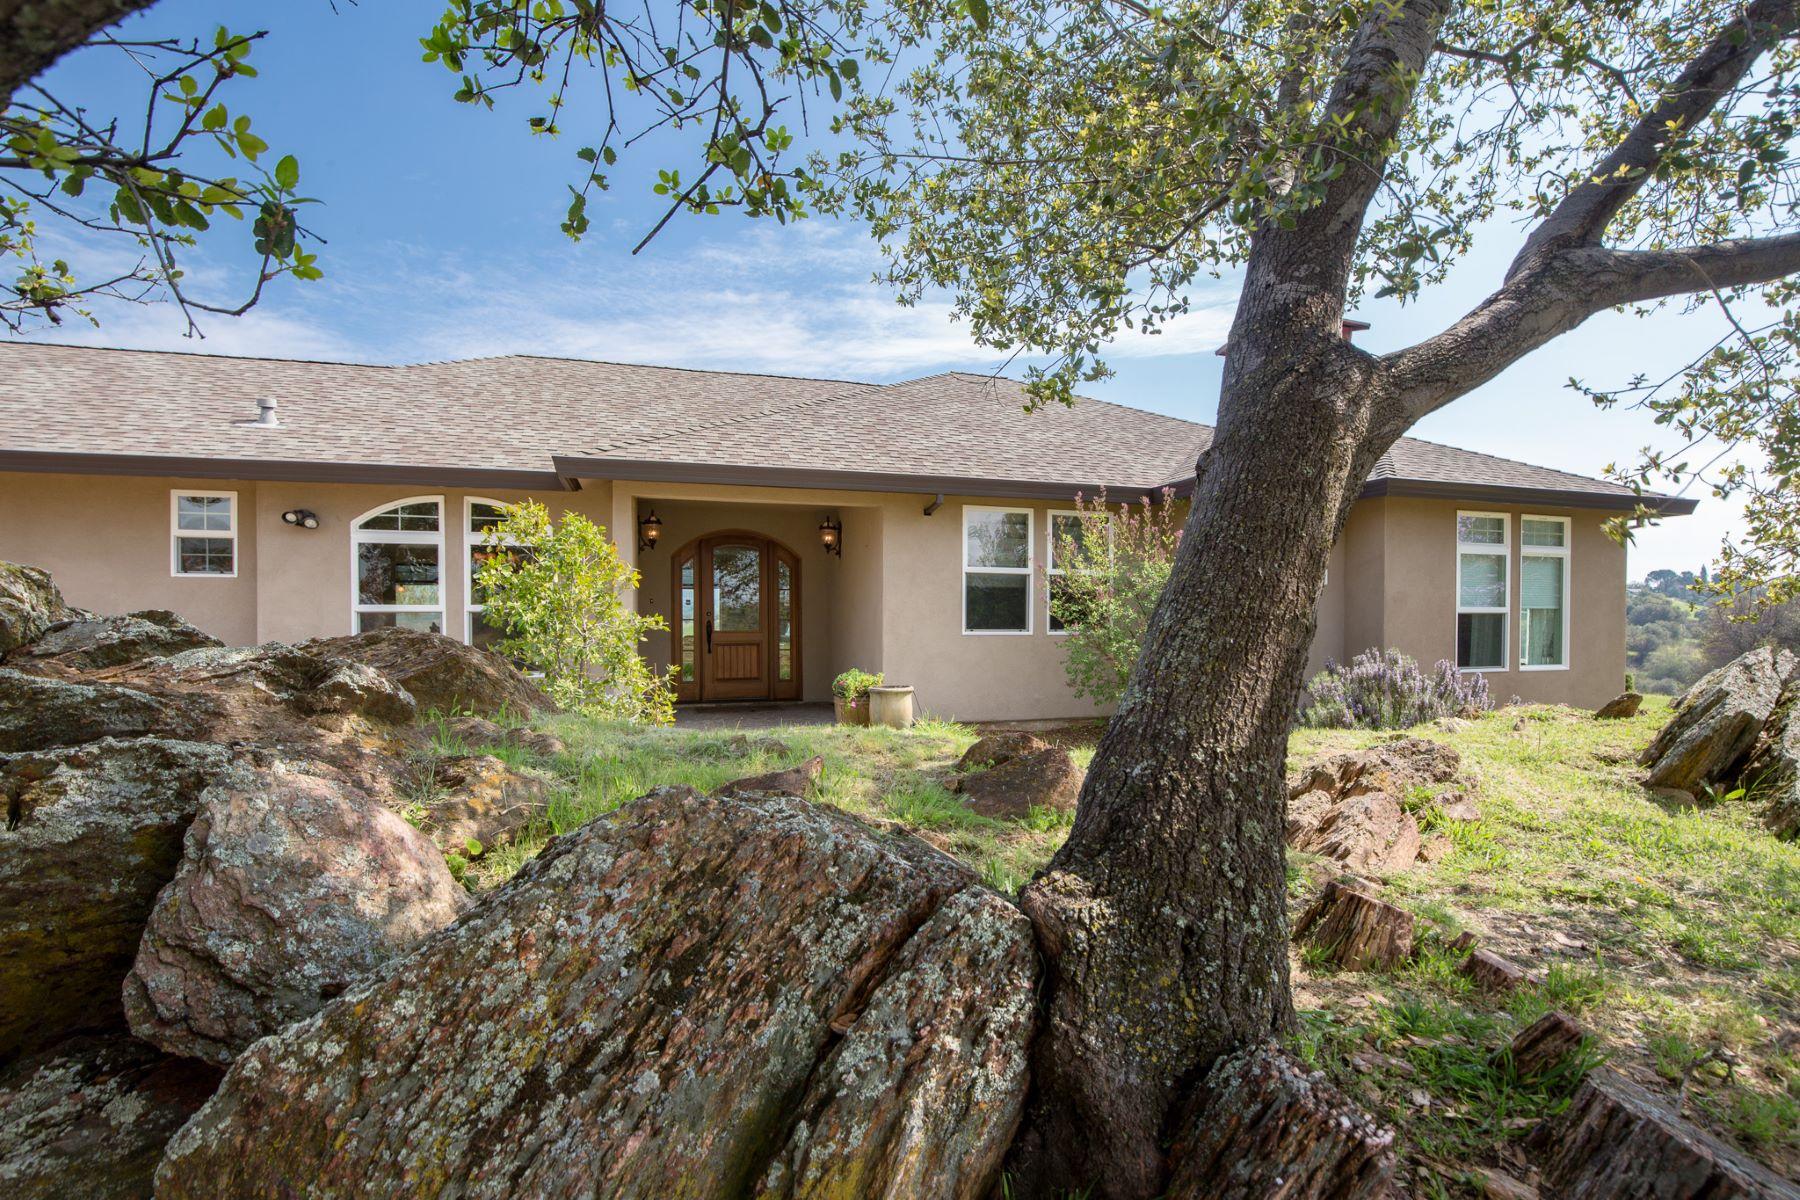 Casa Unifamiliar por un Venta en 5545 Running Ridge Plymouth, California 95669 Estados Unidos